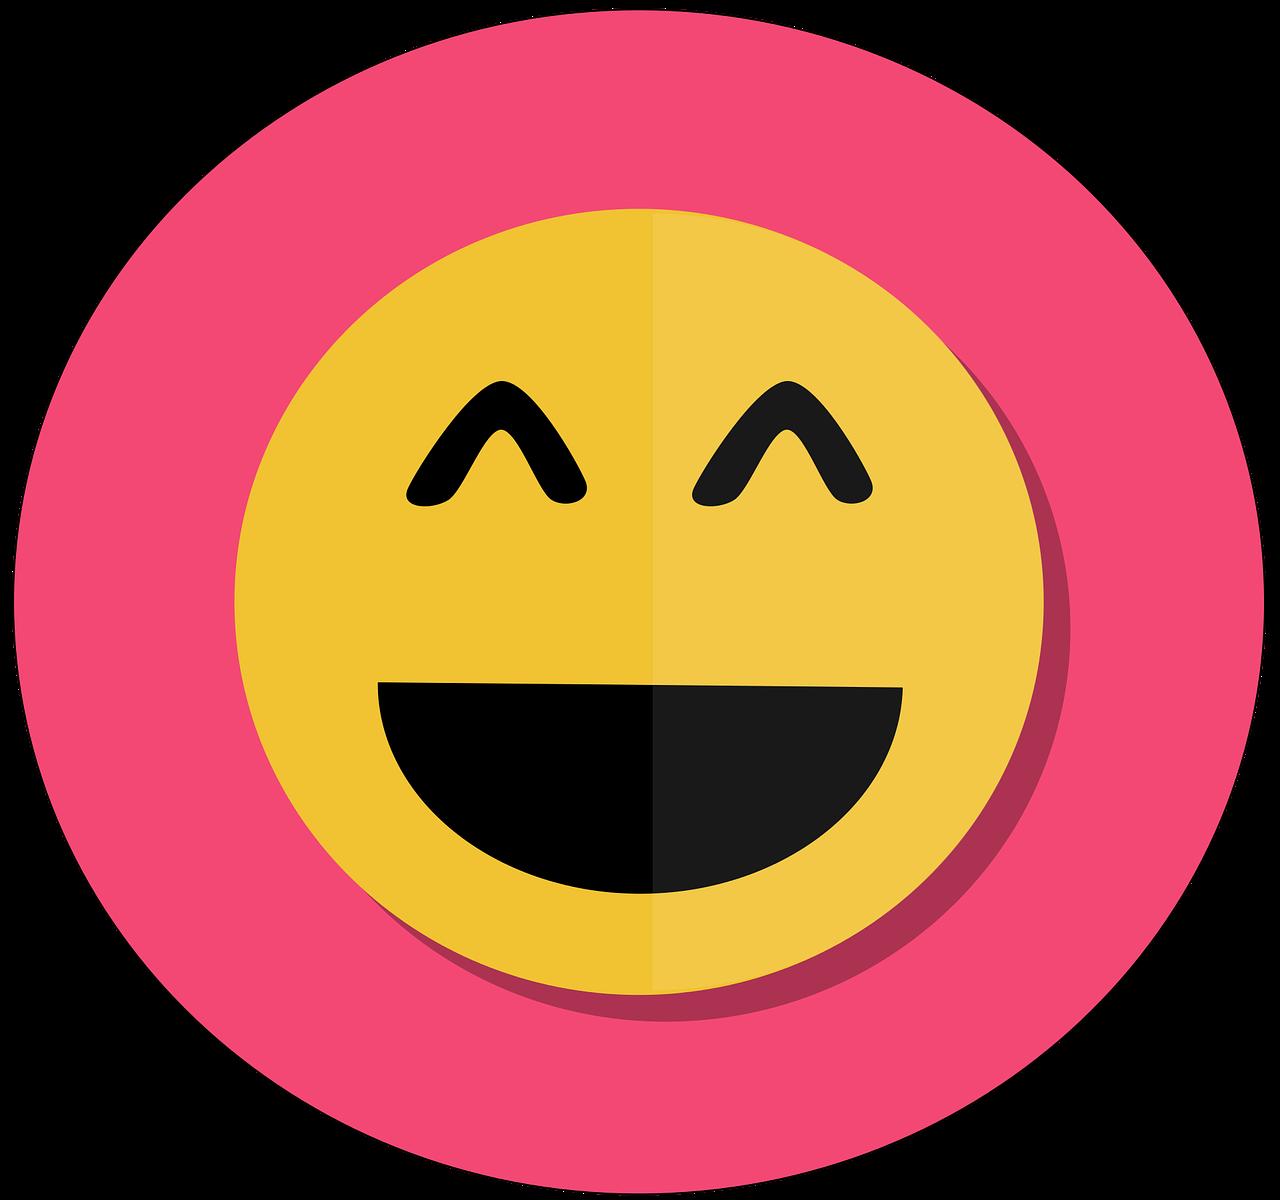 Part a digital marketers. Lizard clipart emoji